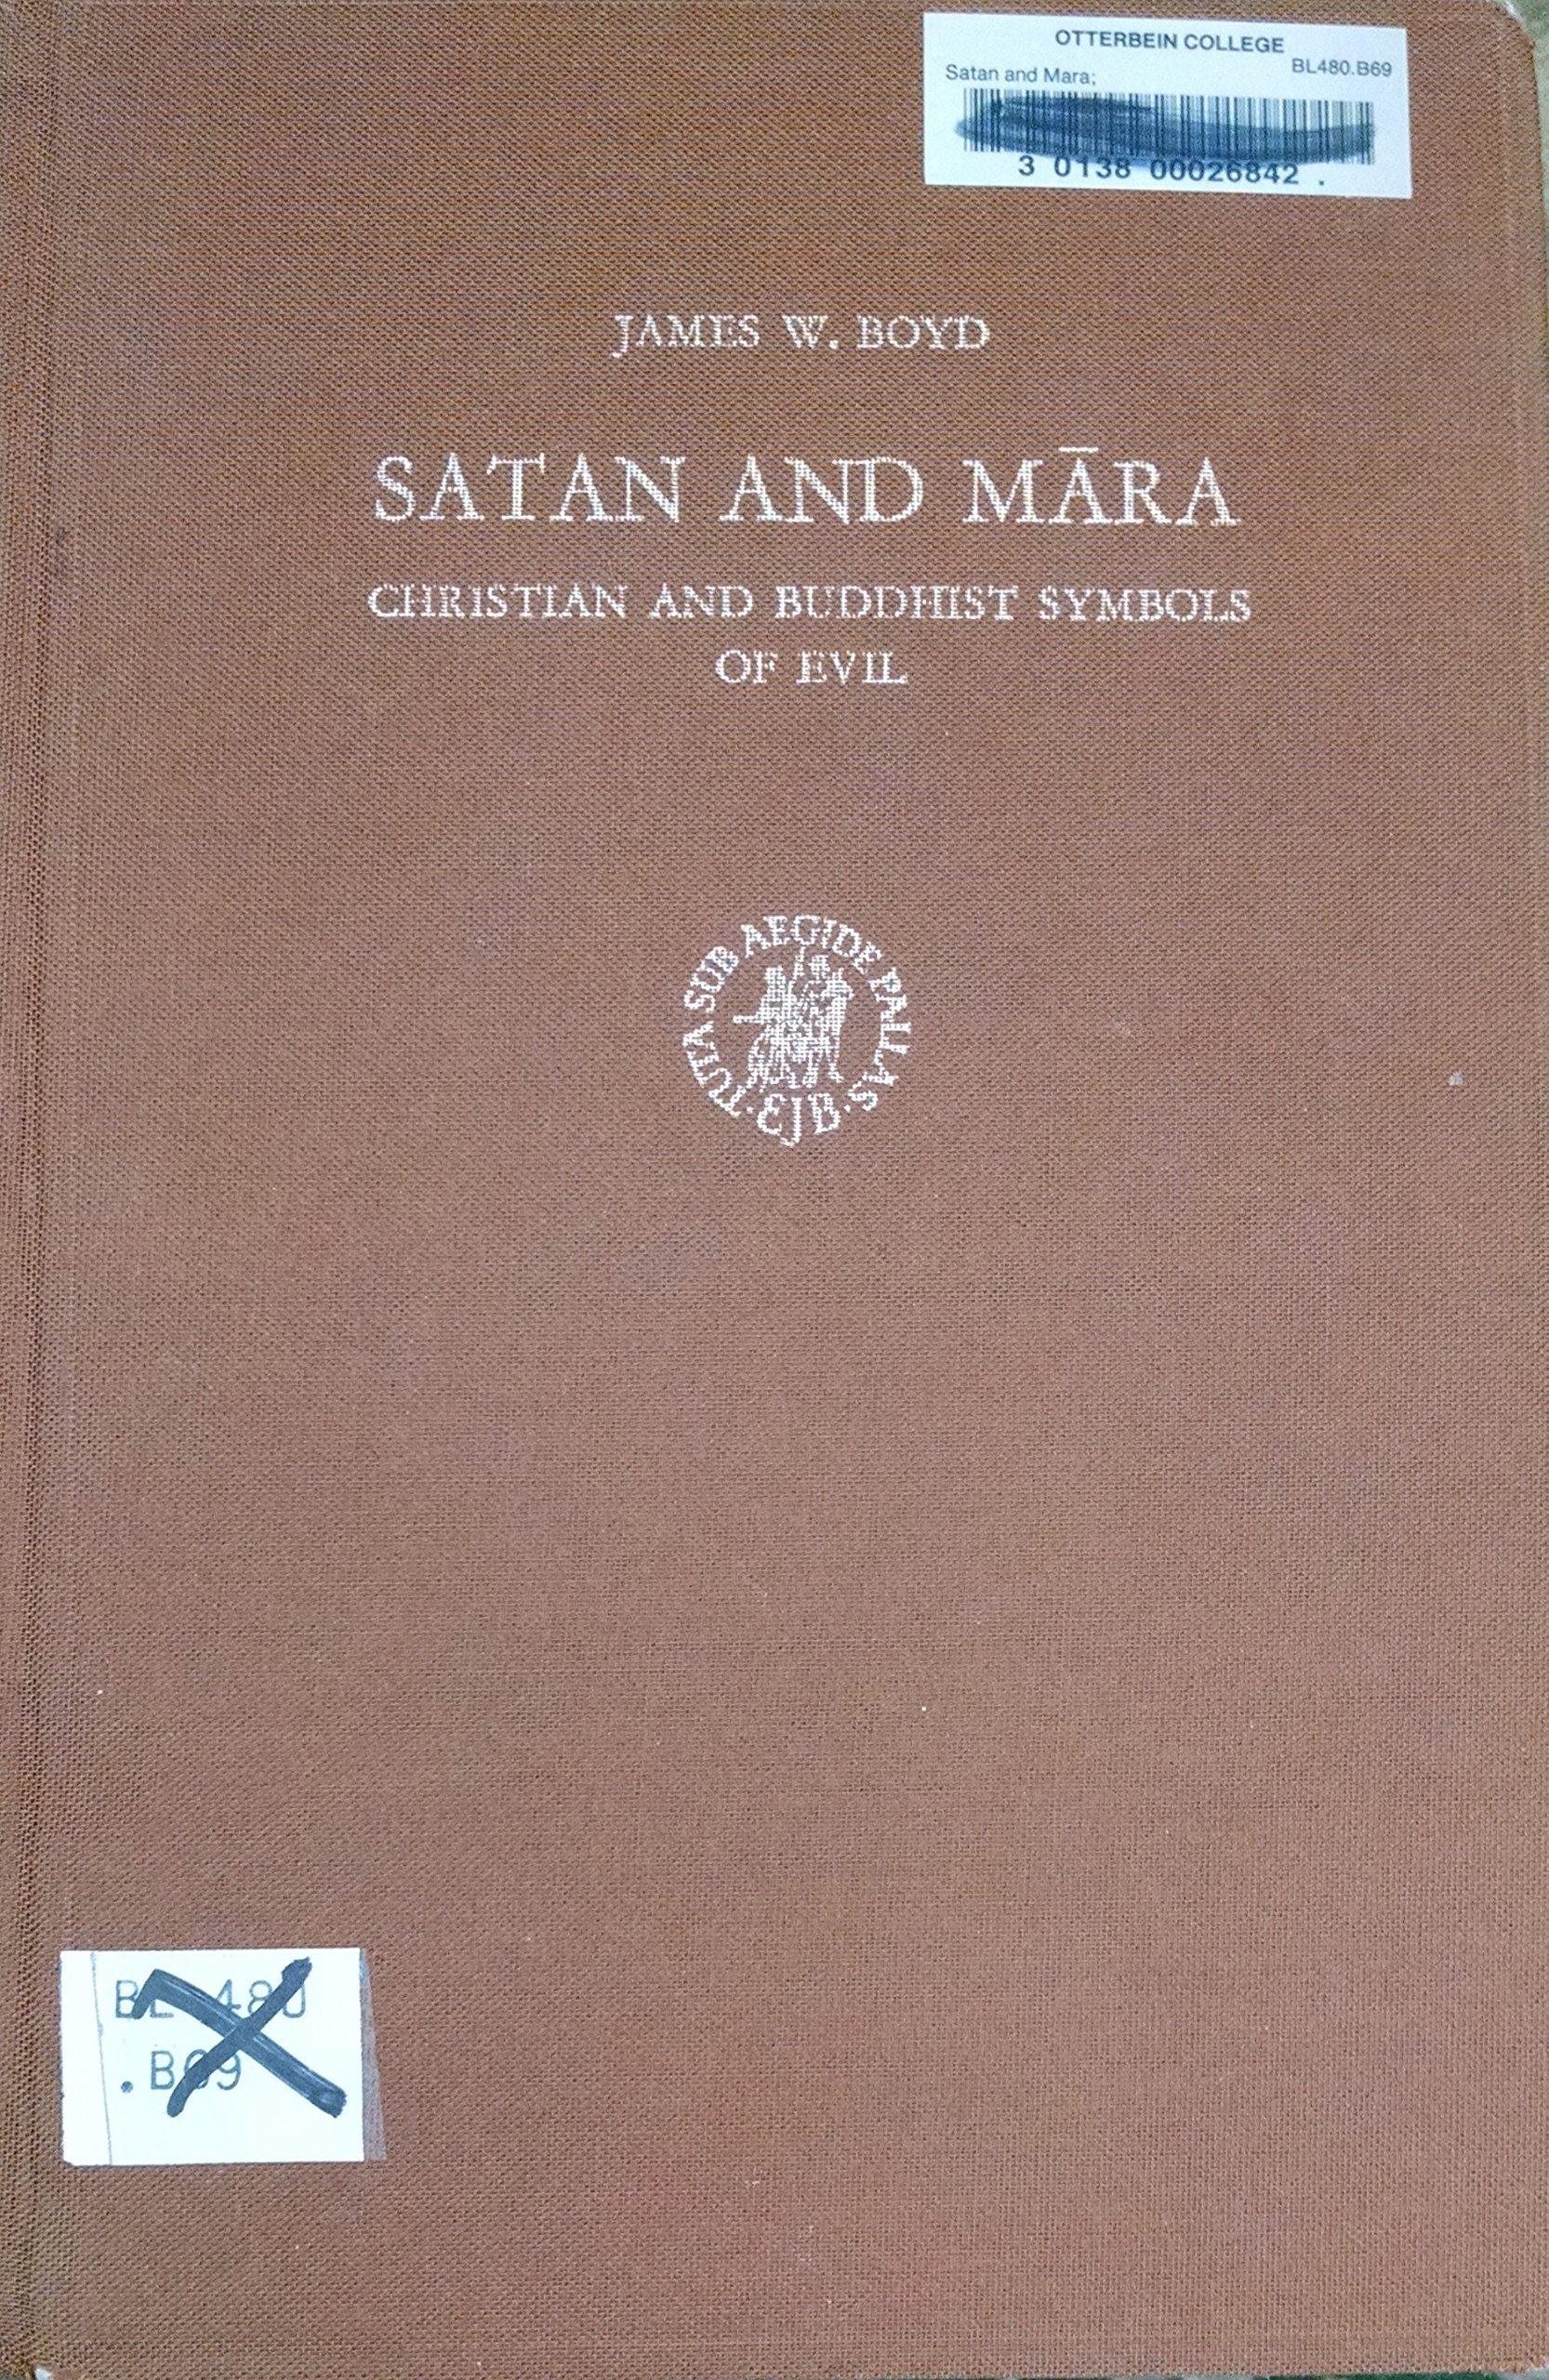 Boyd Satan and Mara cover art